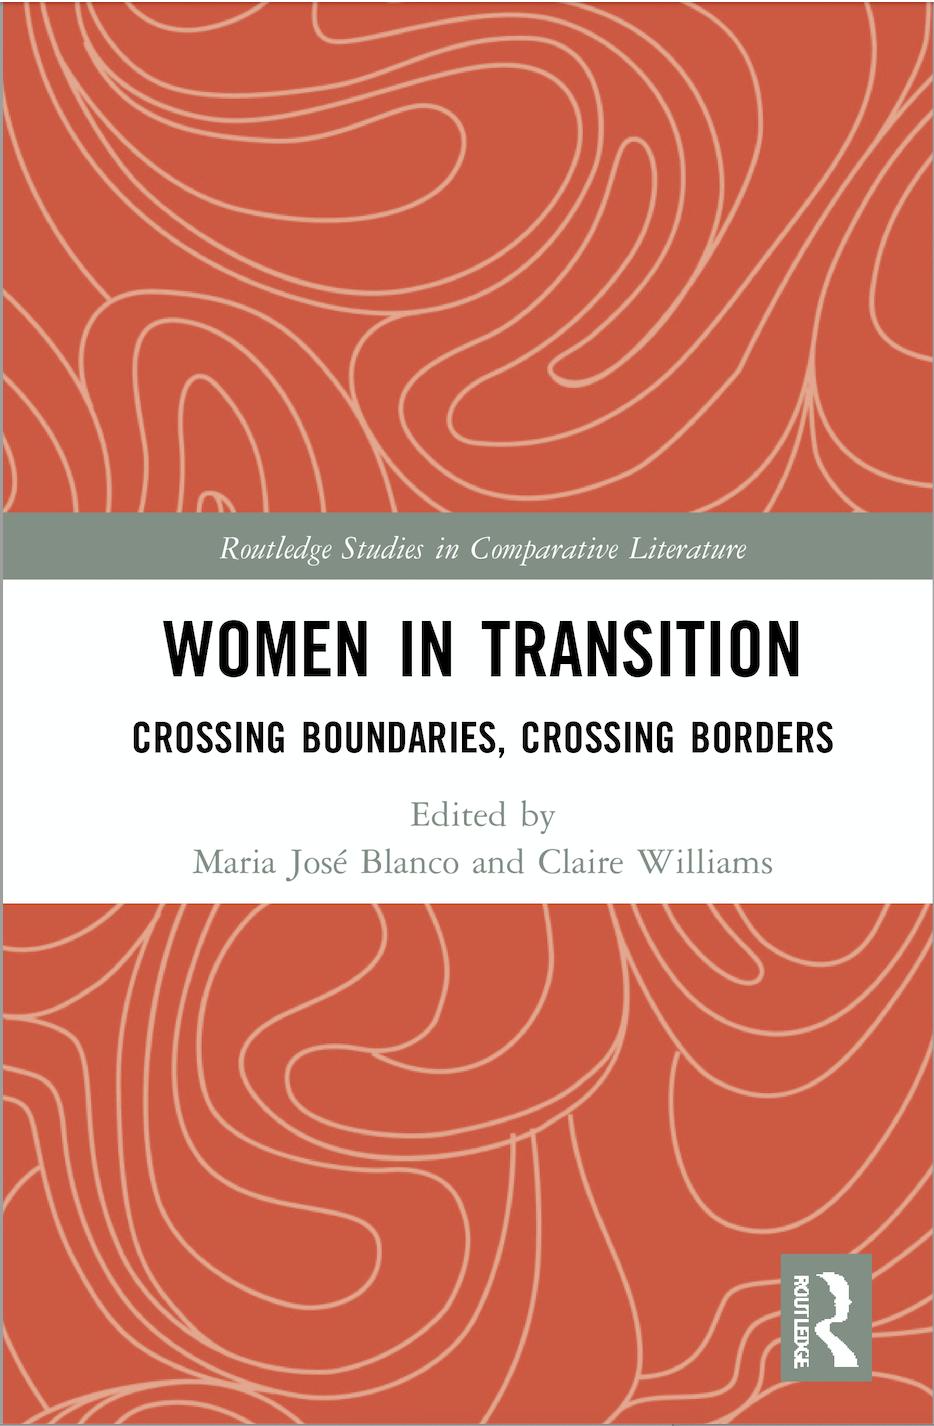 M-J.Blanco,C.Williams (ed.).Women in Transition. Crossing Boundaries, Crossing Borders.